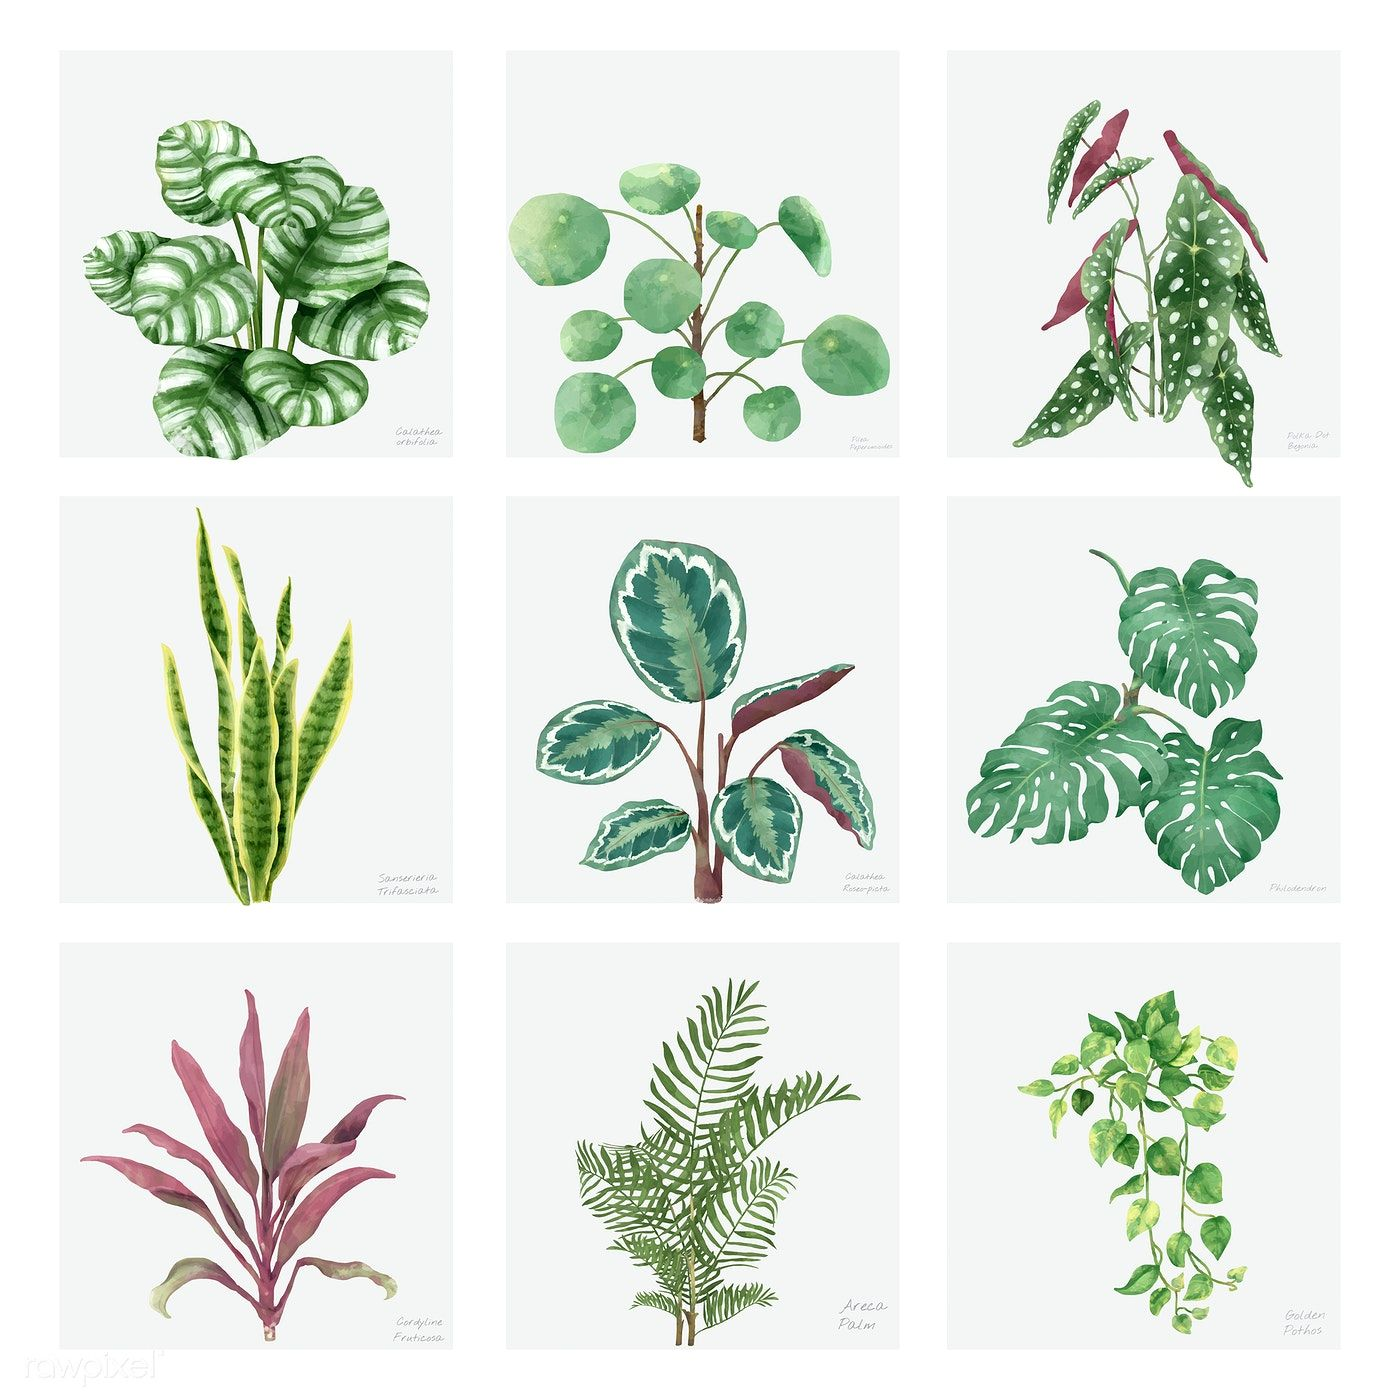 17 indoor plants Watercolor ideas